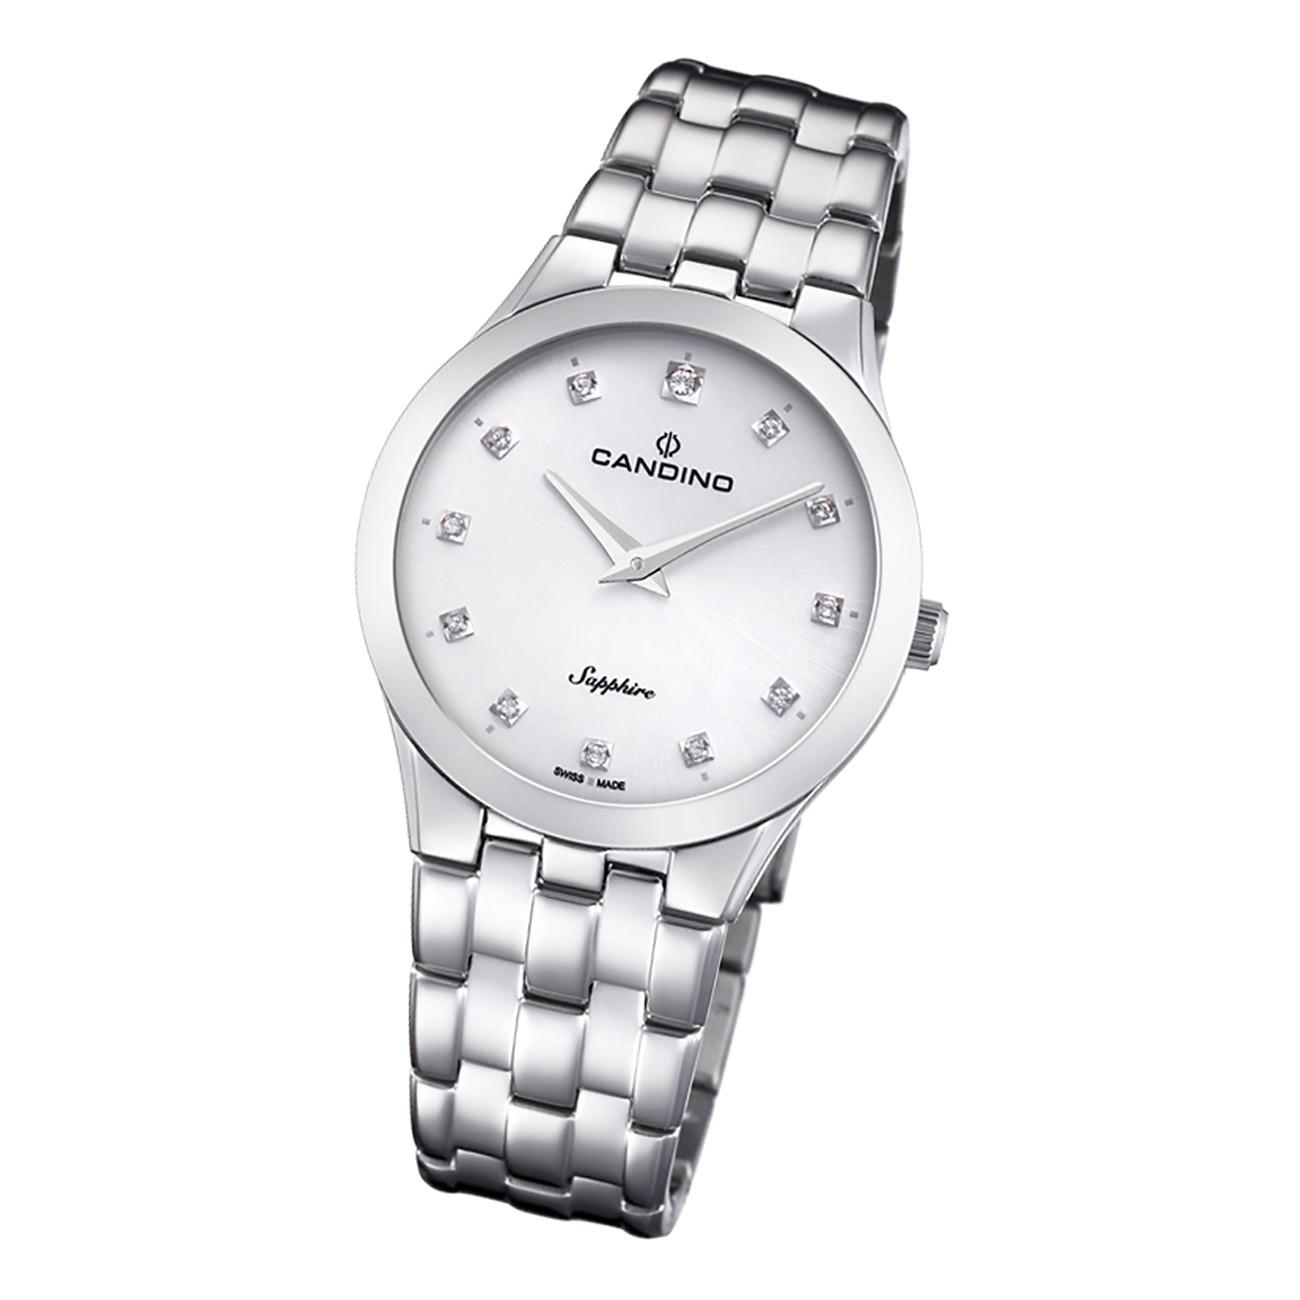 Candino Damen Armbanduhr Classic C4700/1 Analog Edelstahl silber UC4700/1